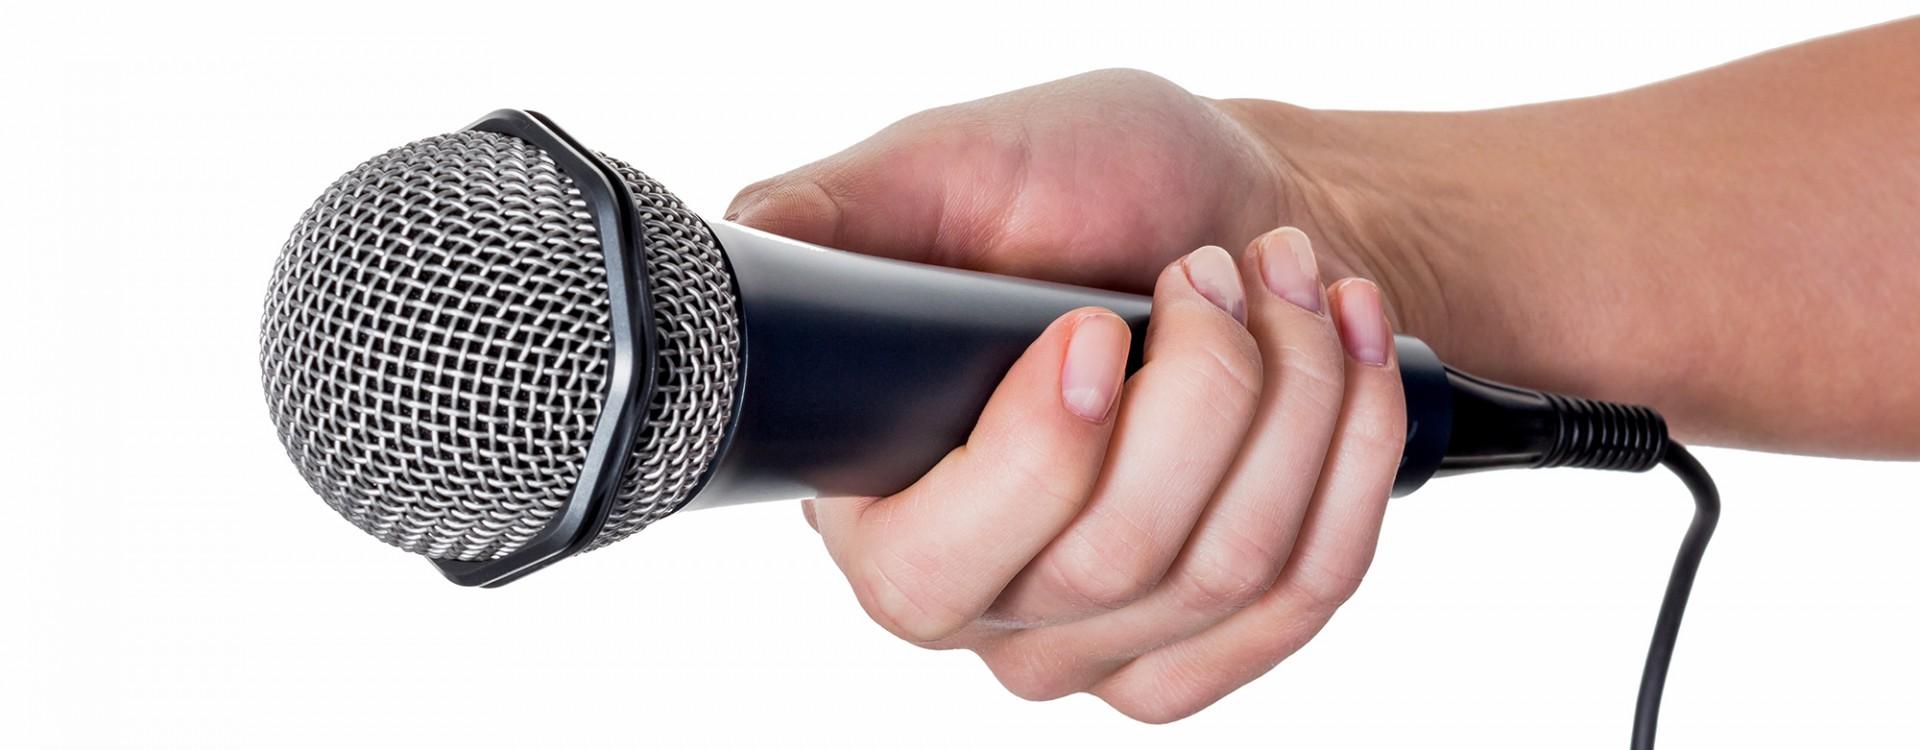 Interview mit Mikrofon